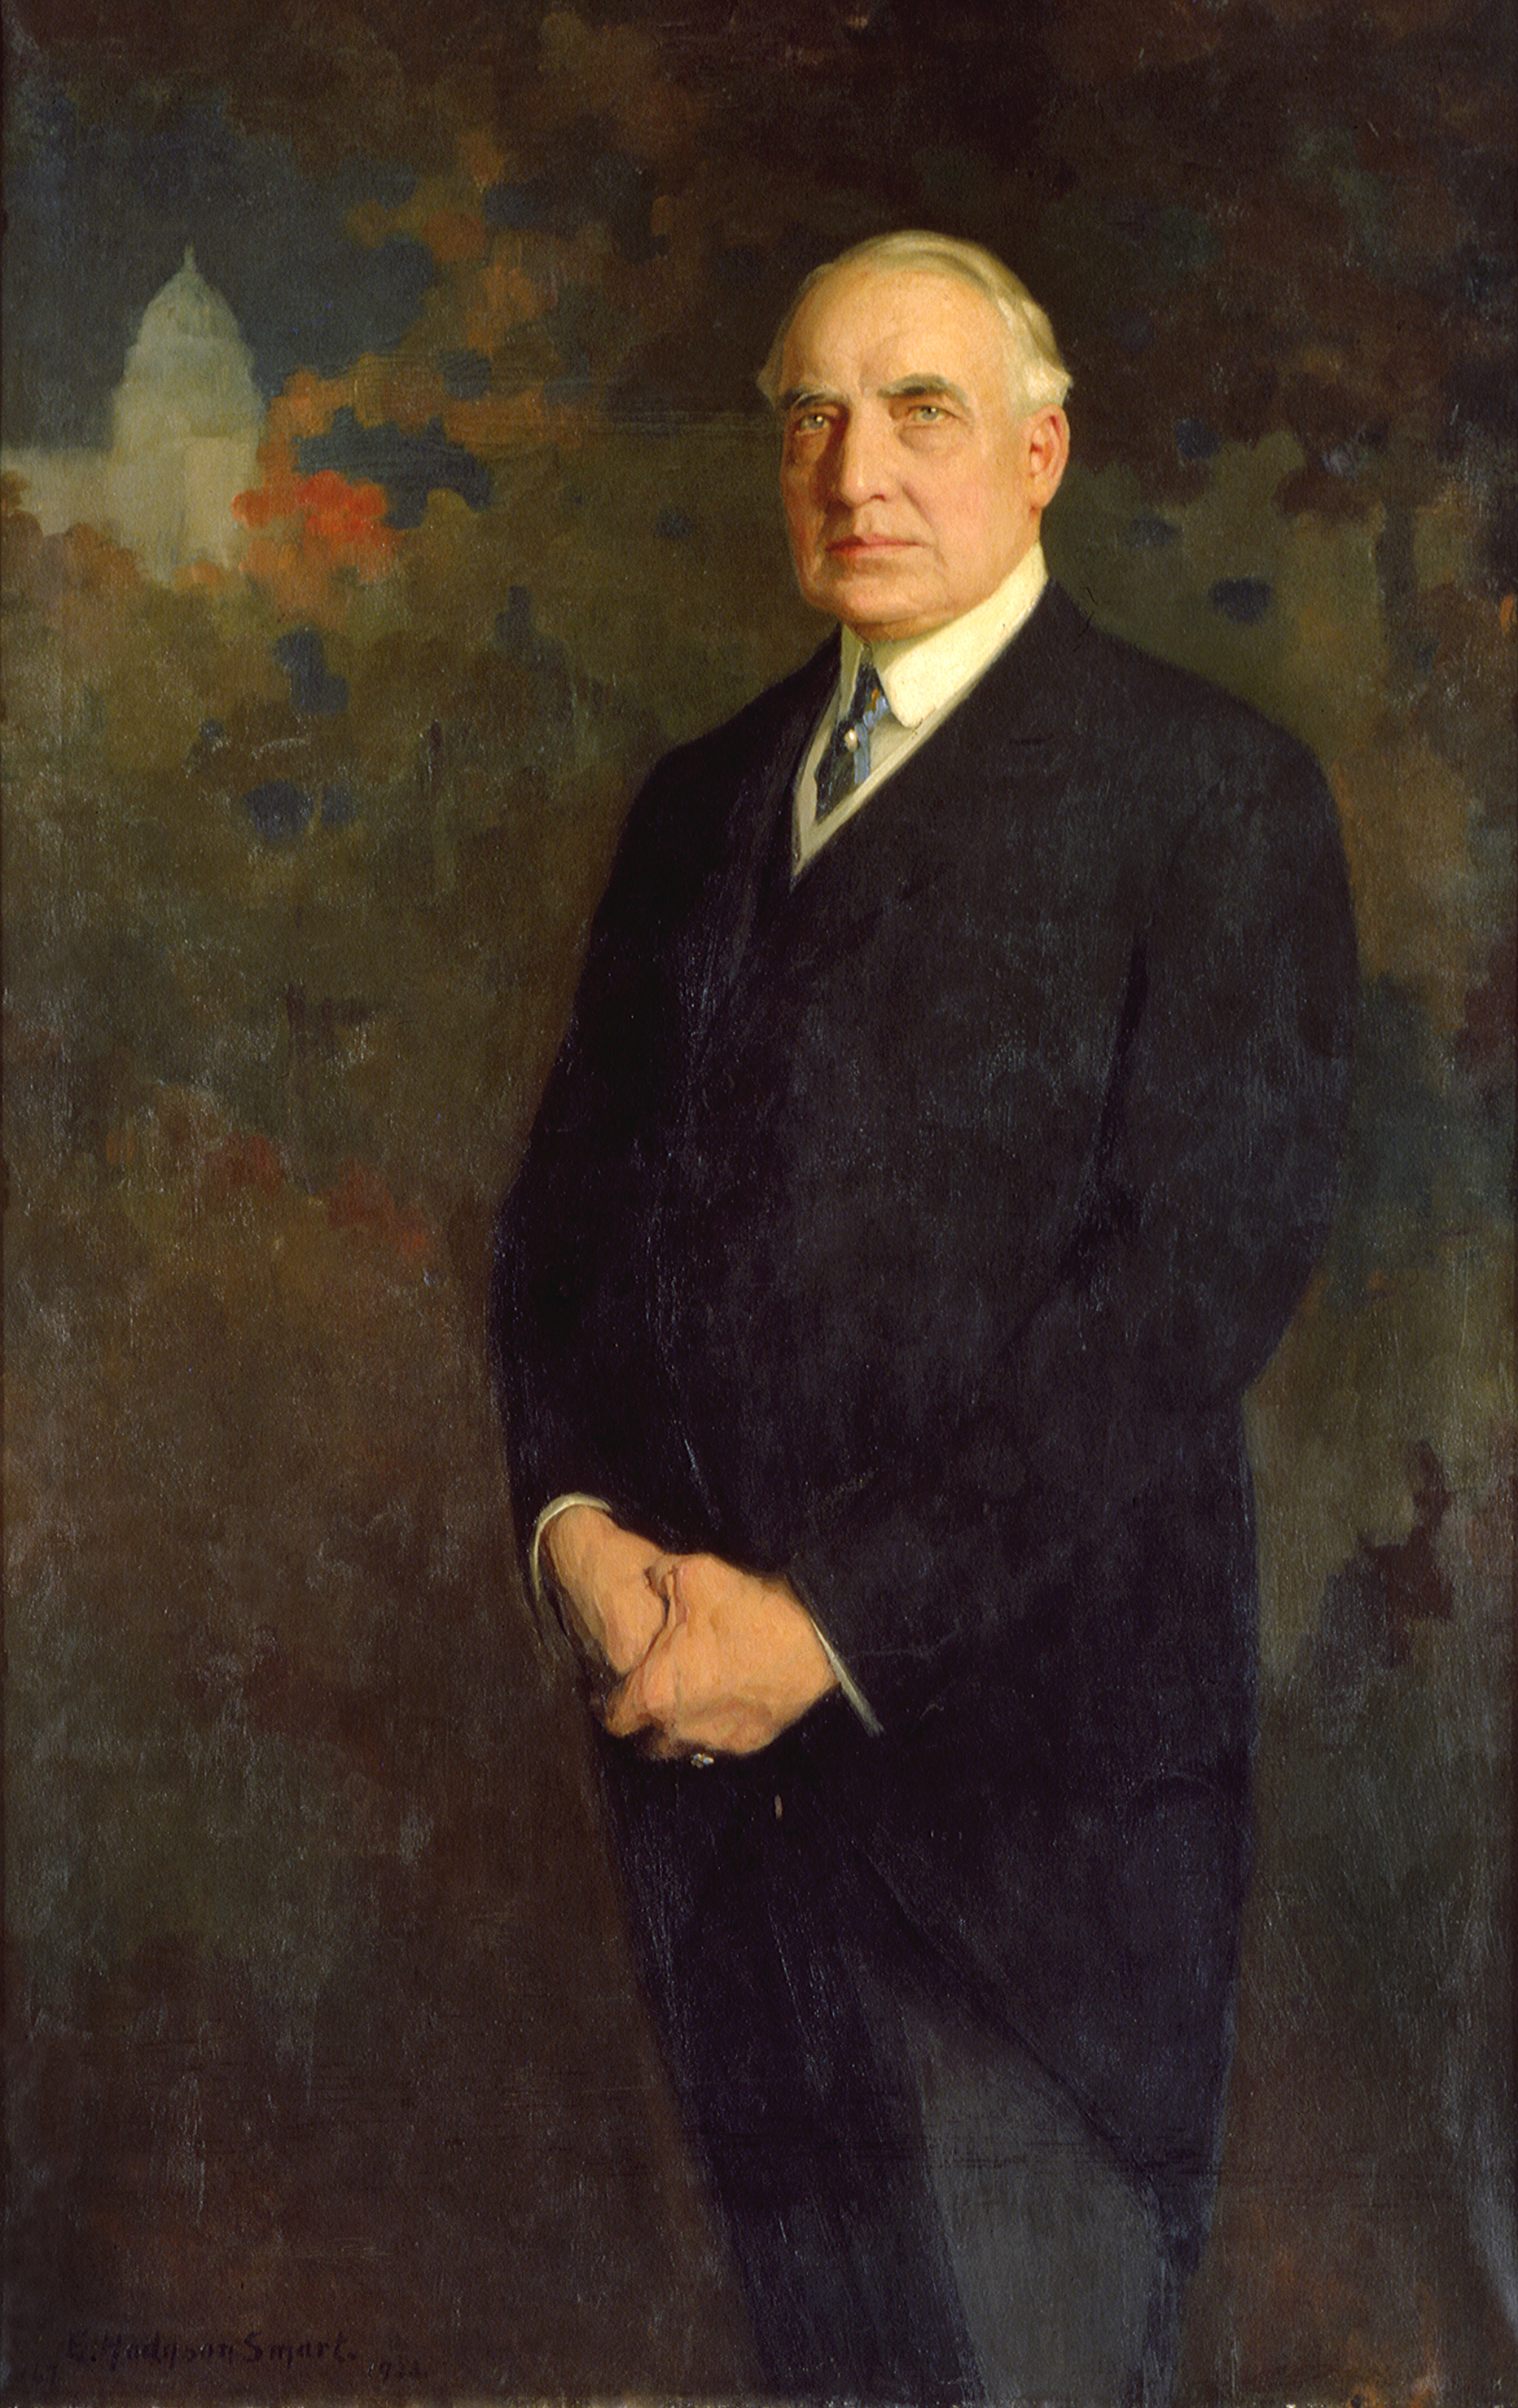 Official portrait of Warren G. Harding